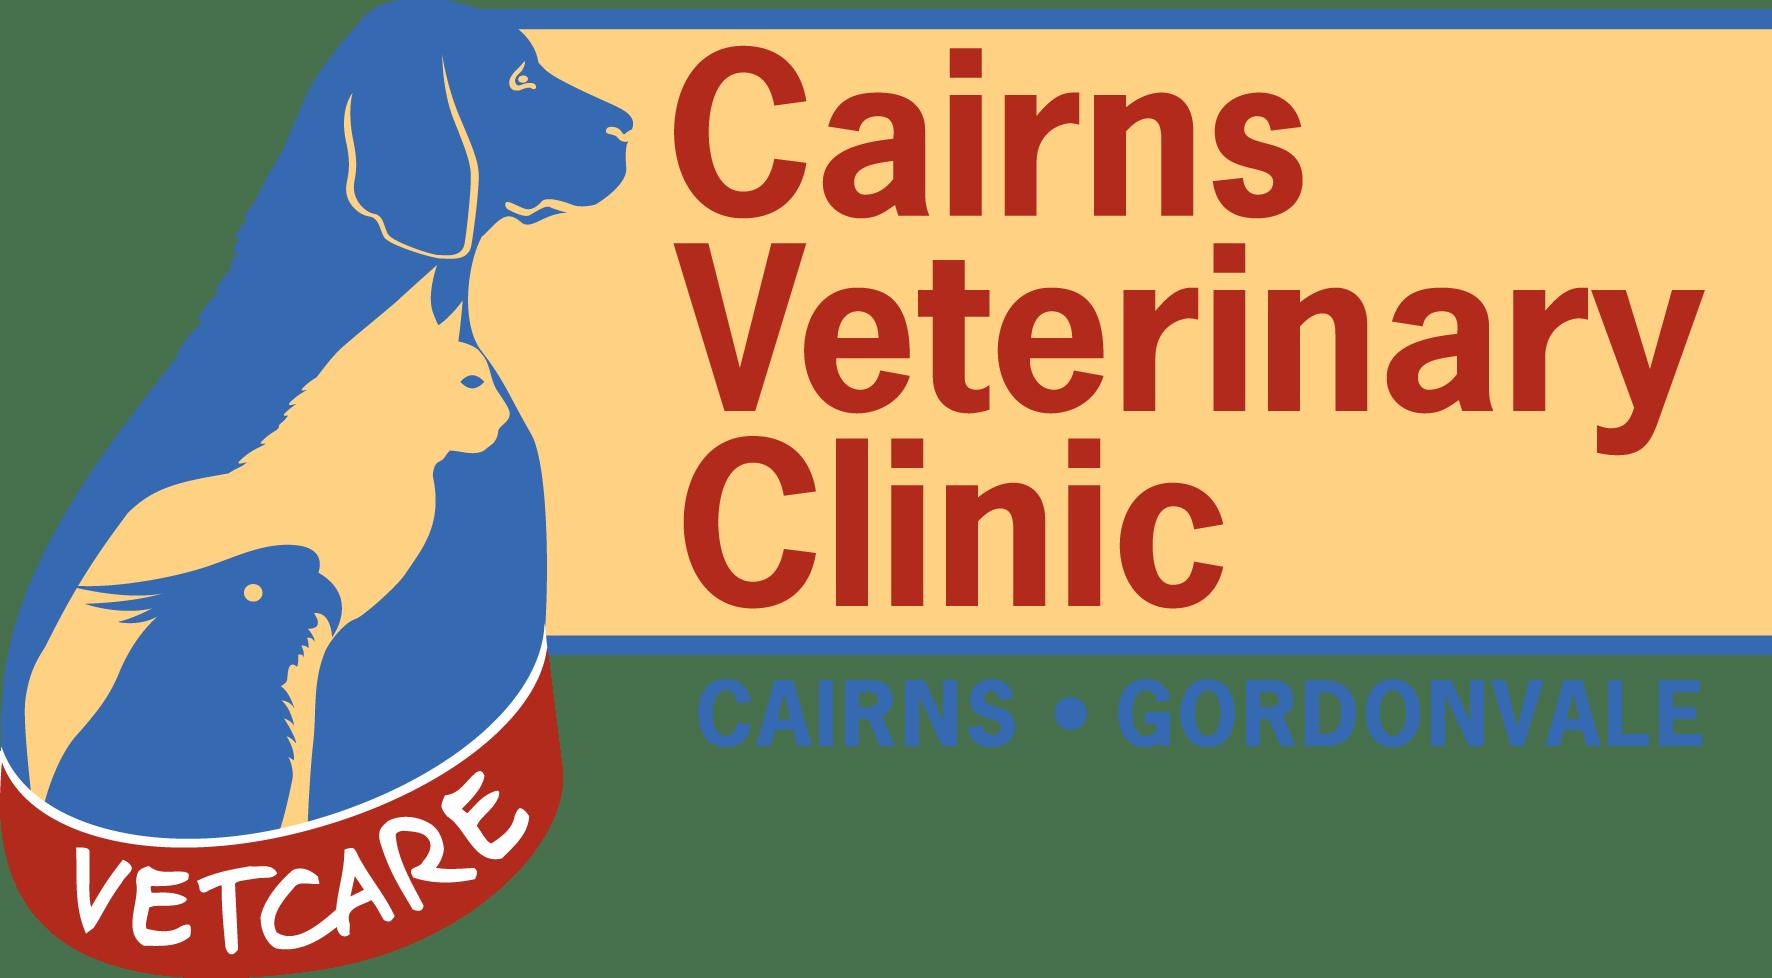 Cairns Veterinary Clinic